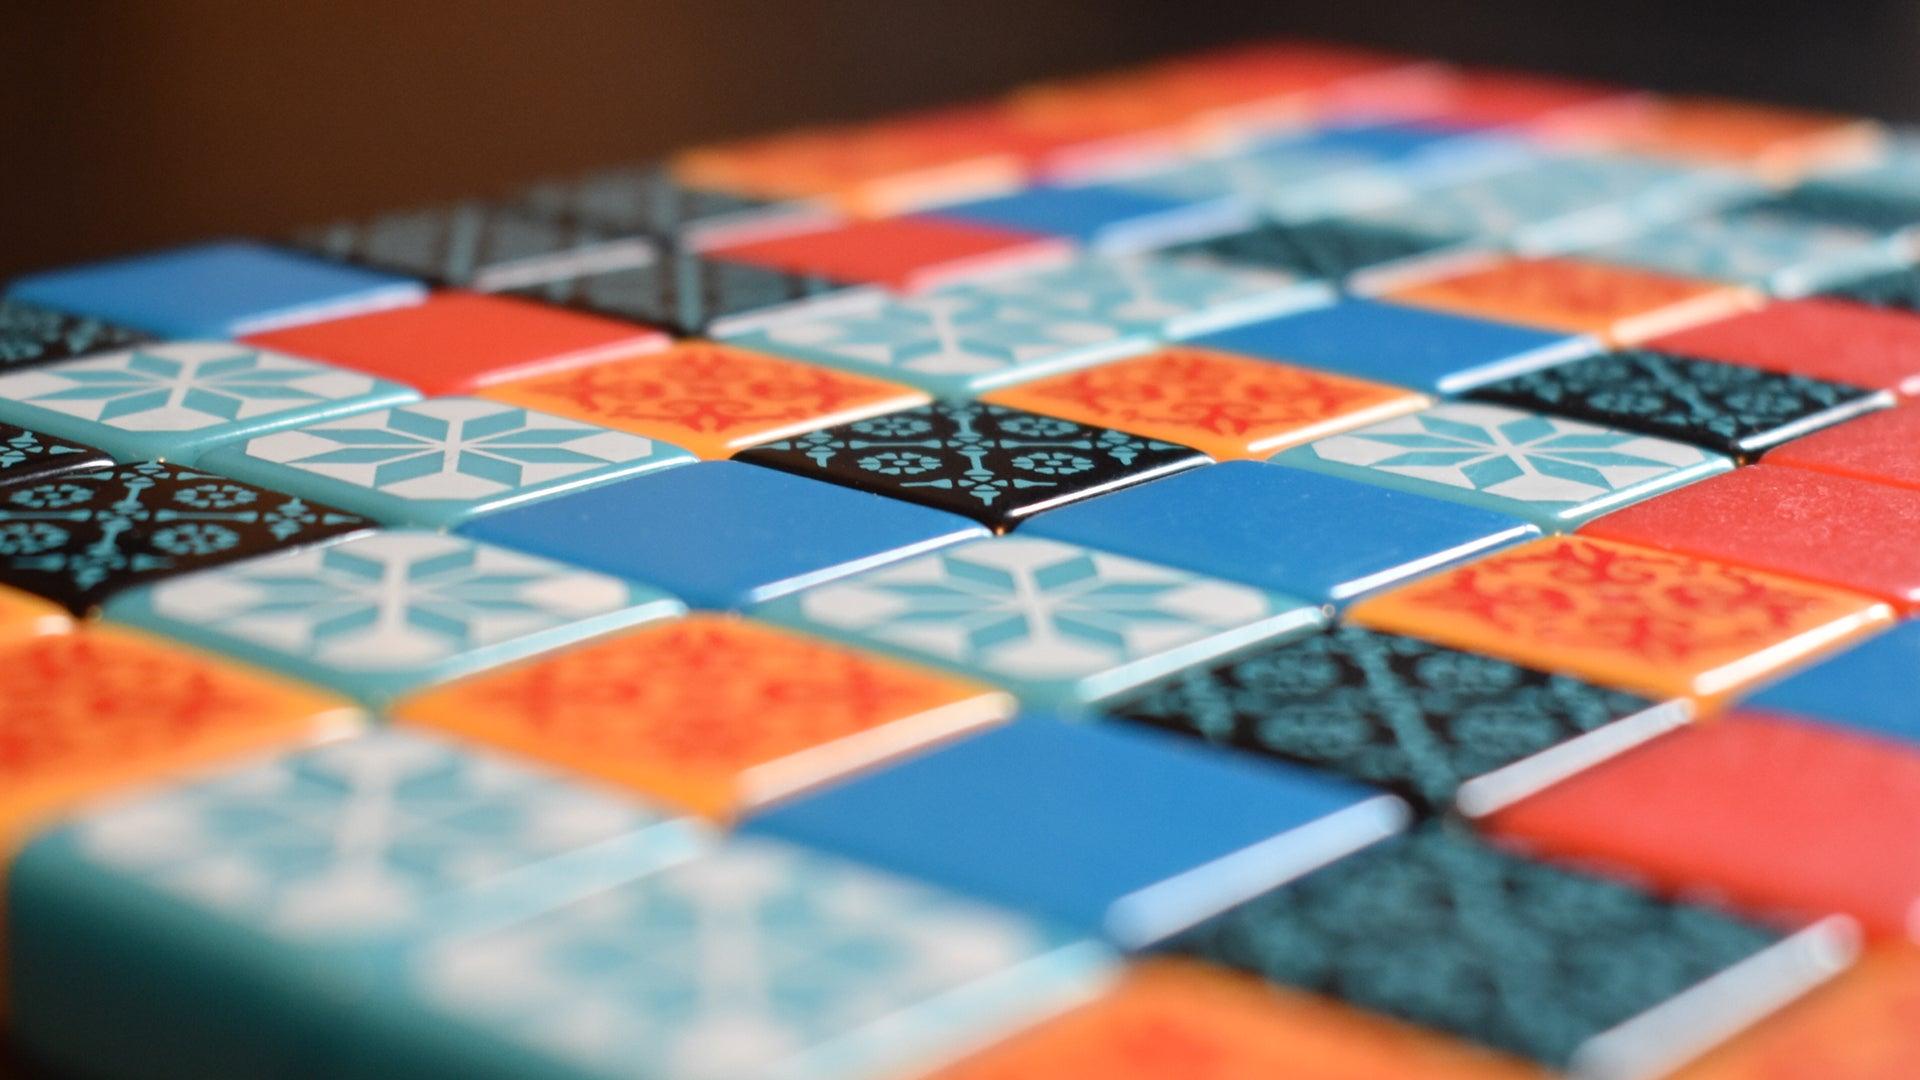 Azul beginner board game photograph